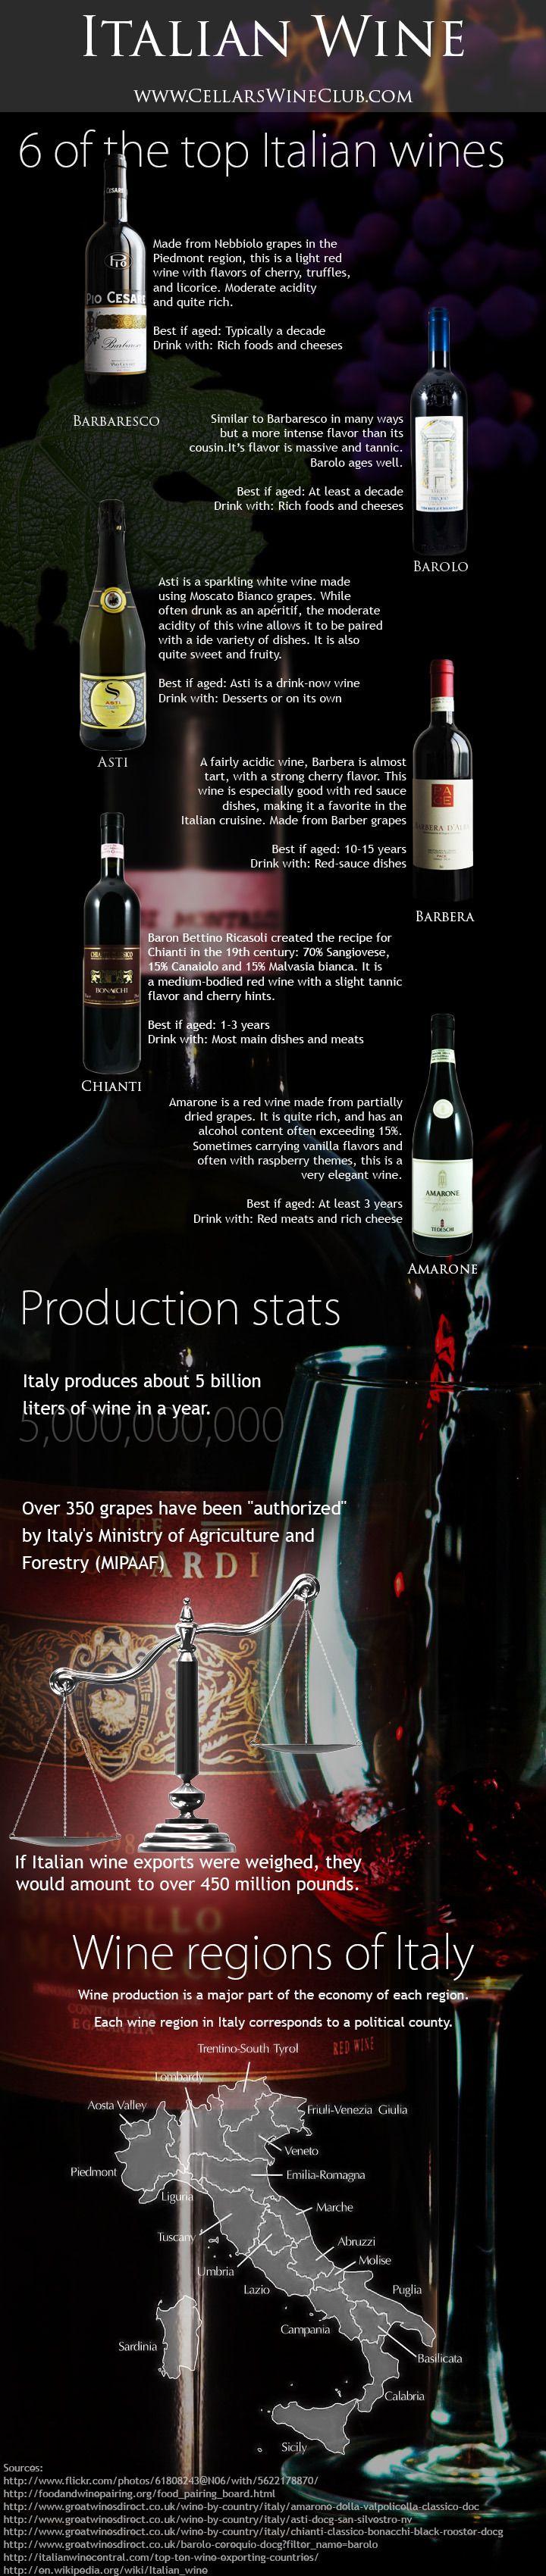 Italian Wine: 6 Of The Top Italian Wines [INFOGRAPHIC] #Italian#wine